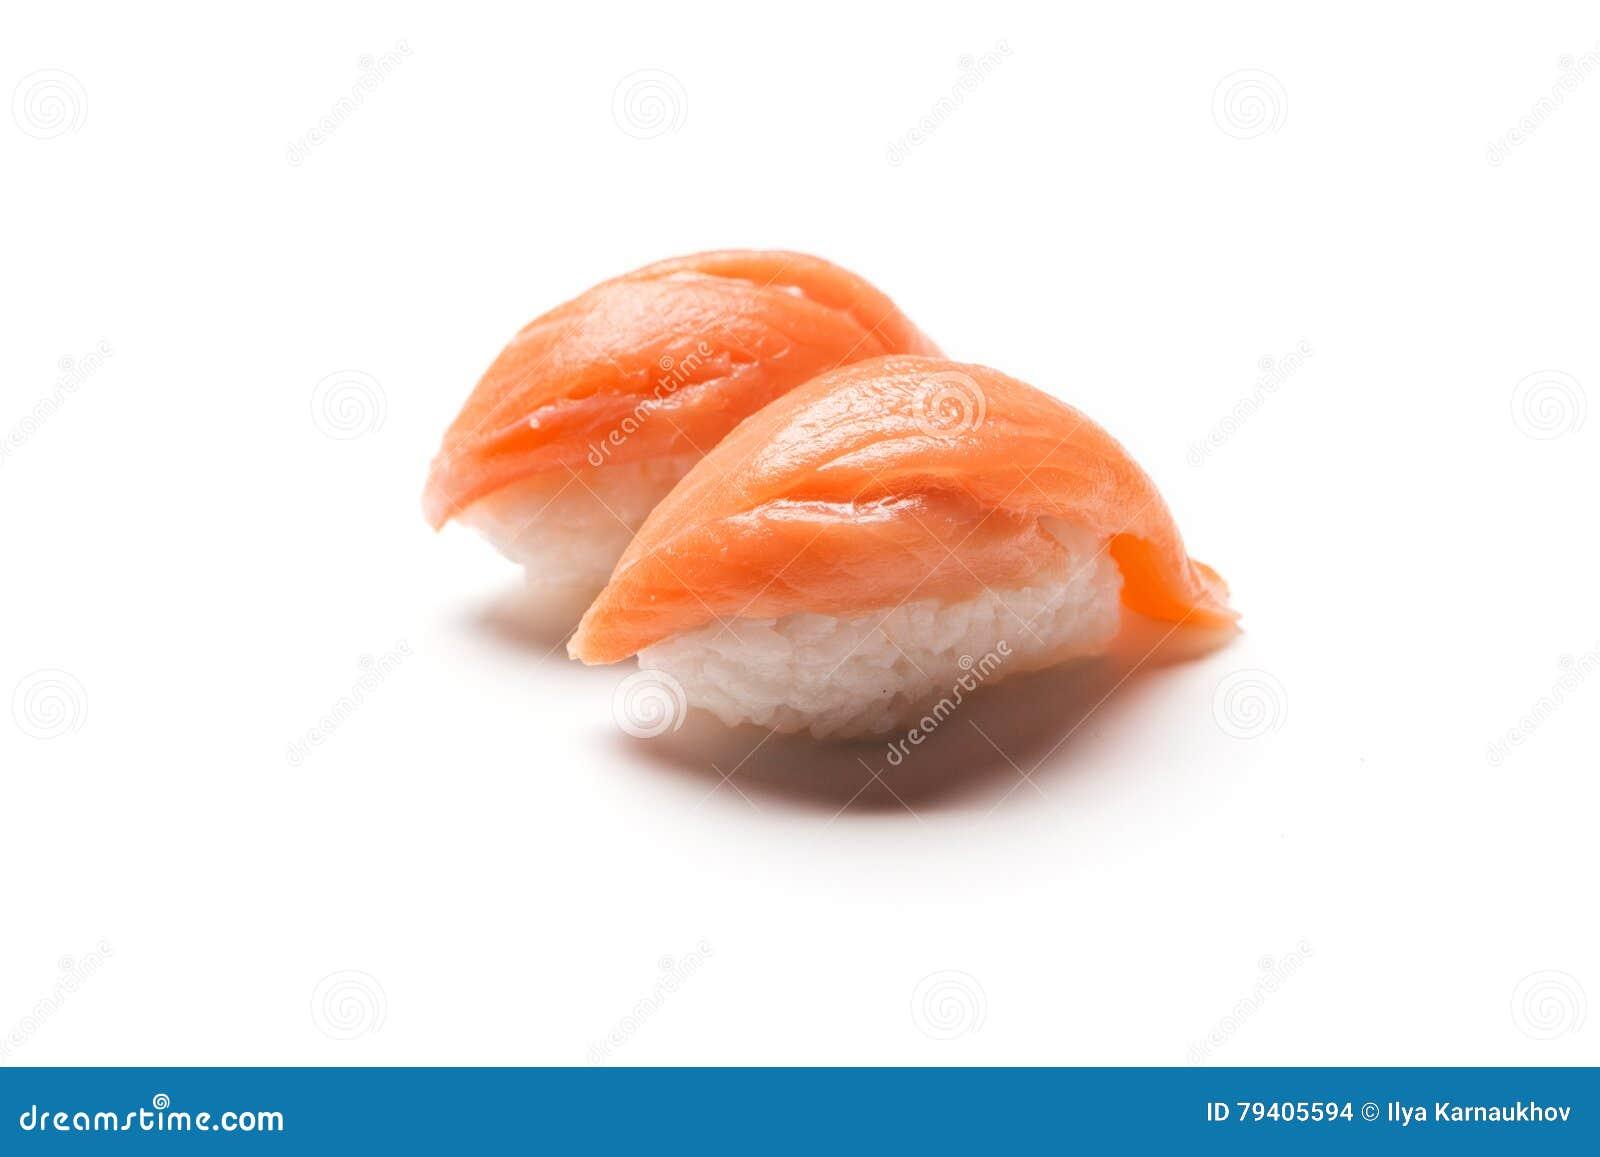 Salmon sushi emoji stock photo  Image of gourmet, dinner - 79405594